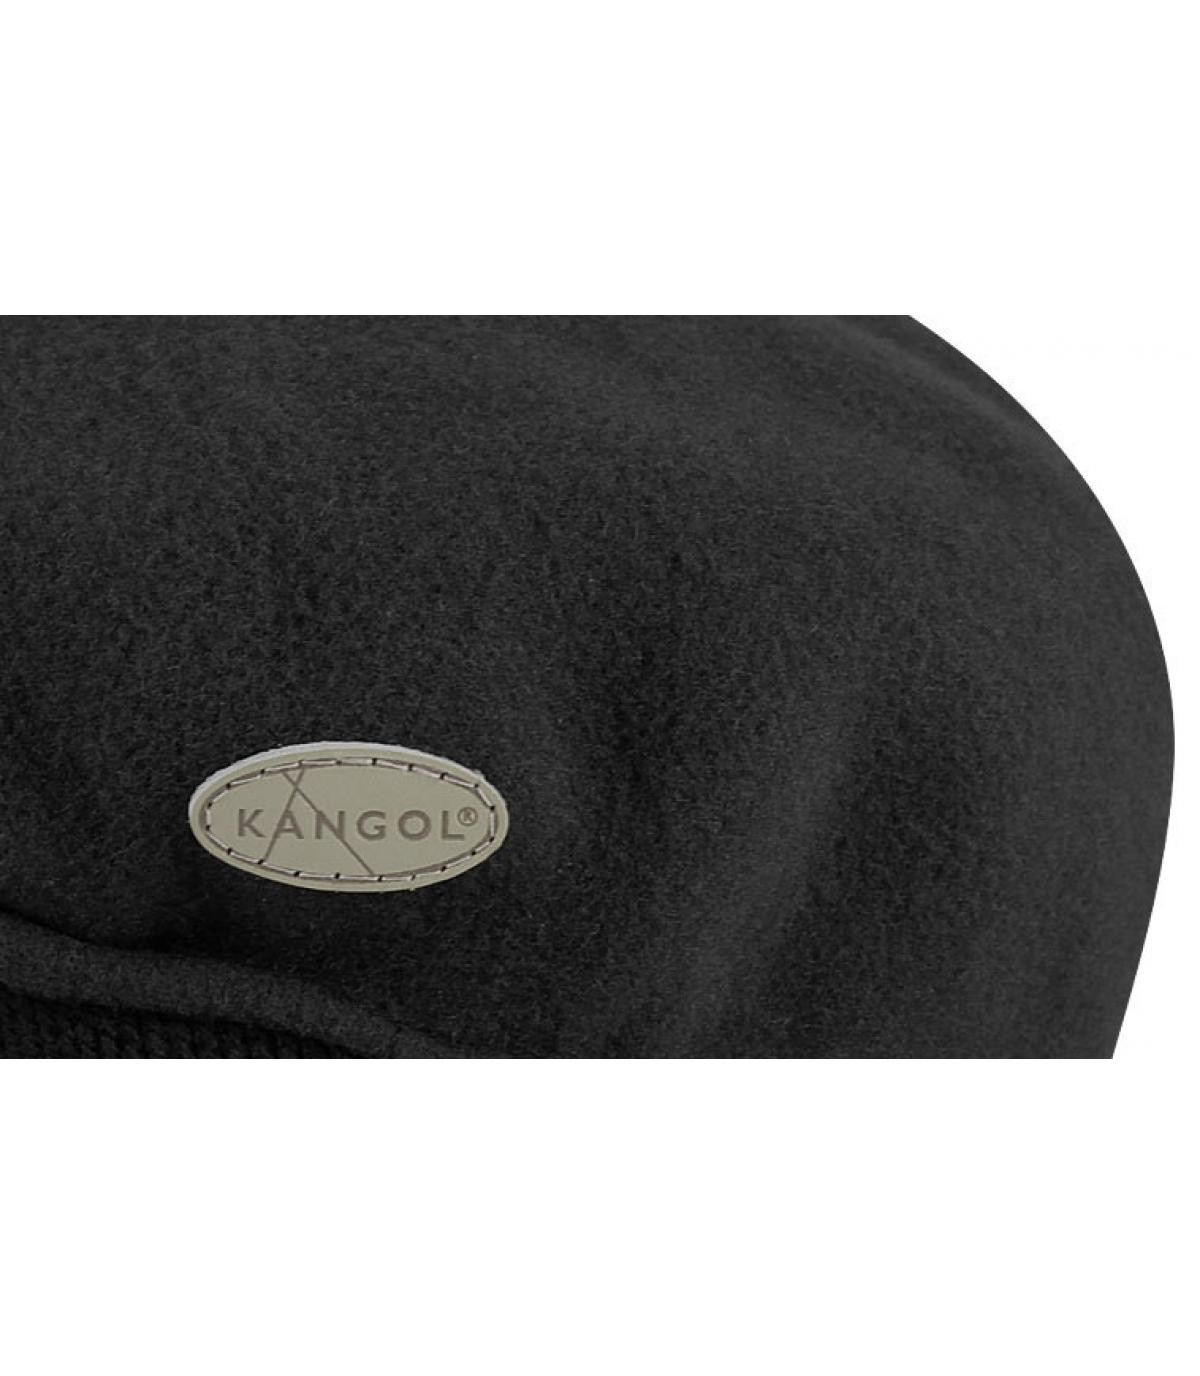 Details 504 wool earflap zwart - afbeeling 2